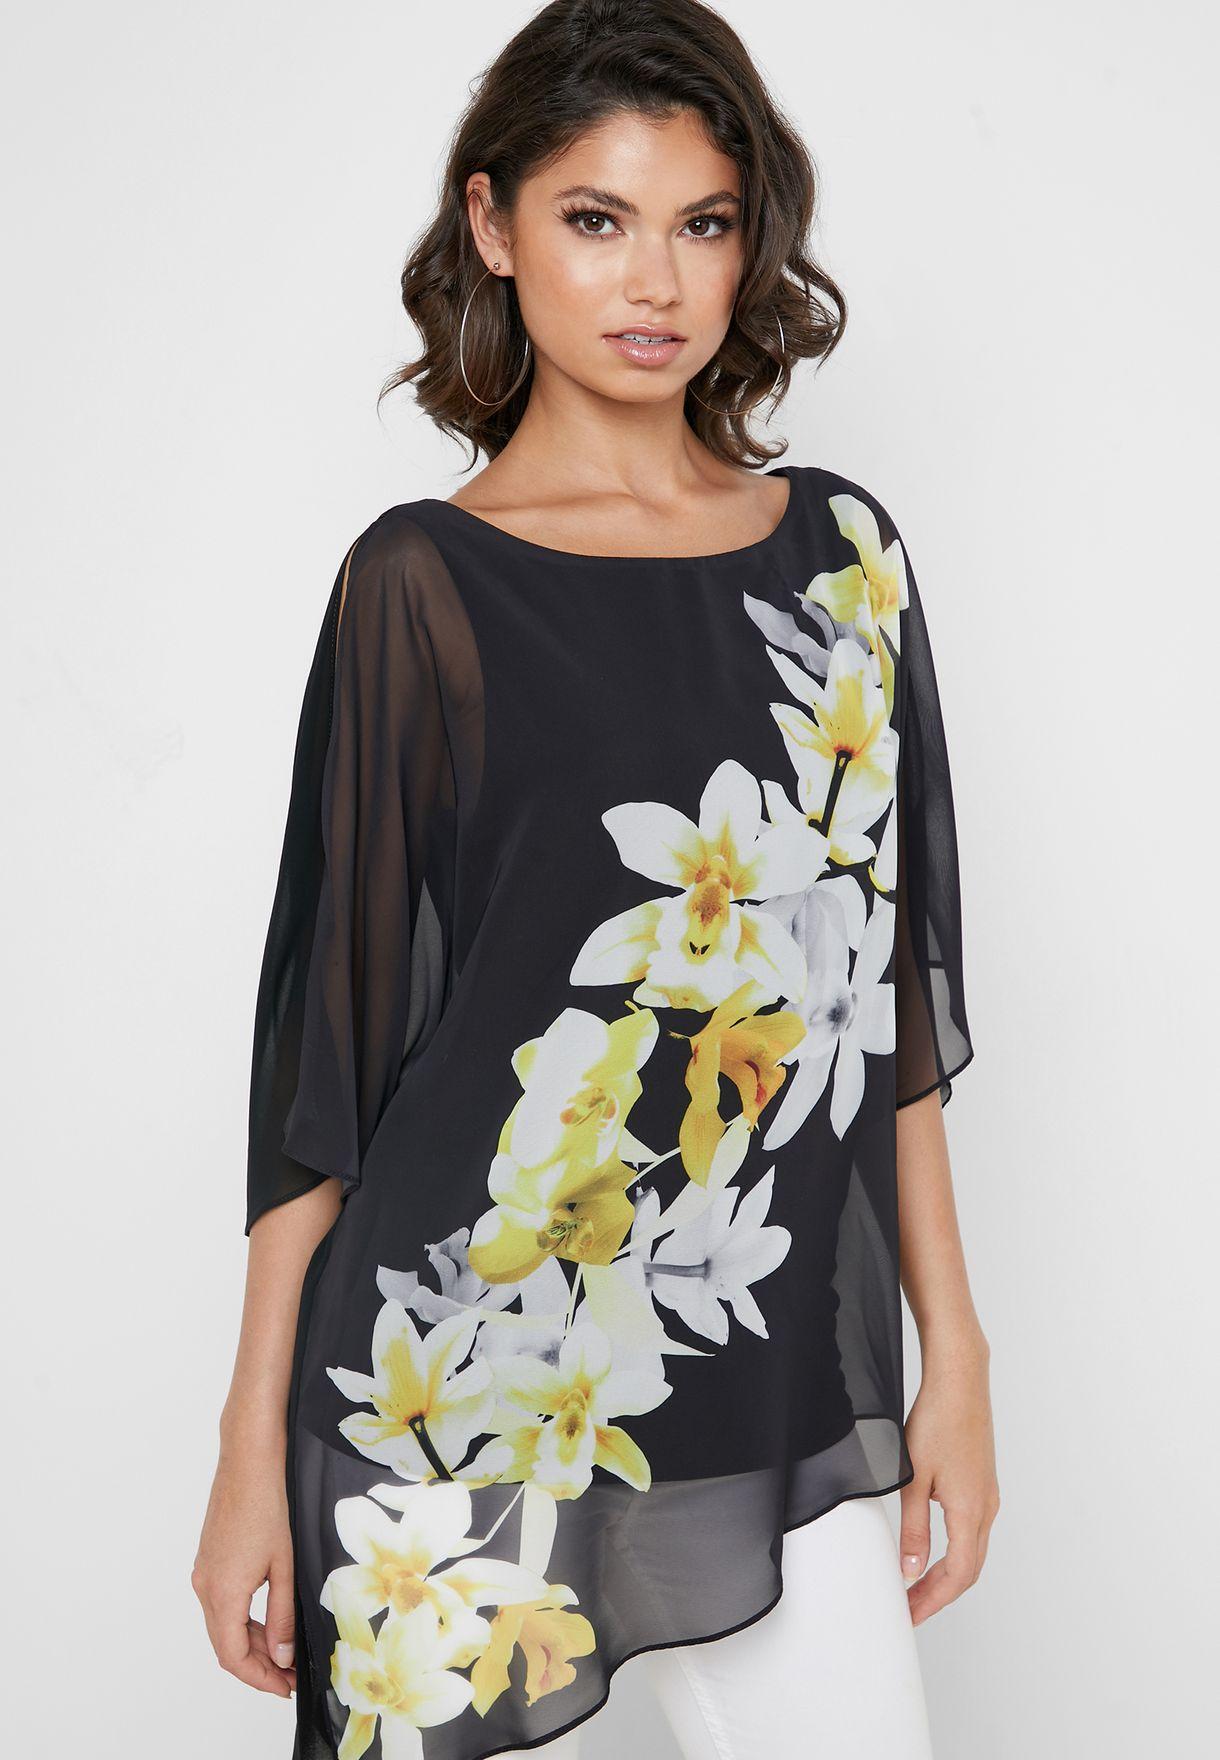 Asymmetric Floral Print Sheer Top